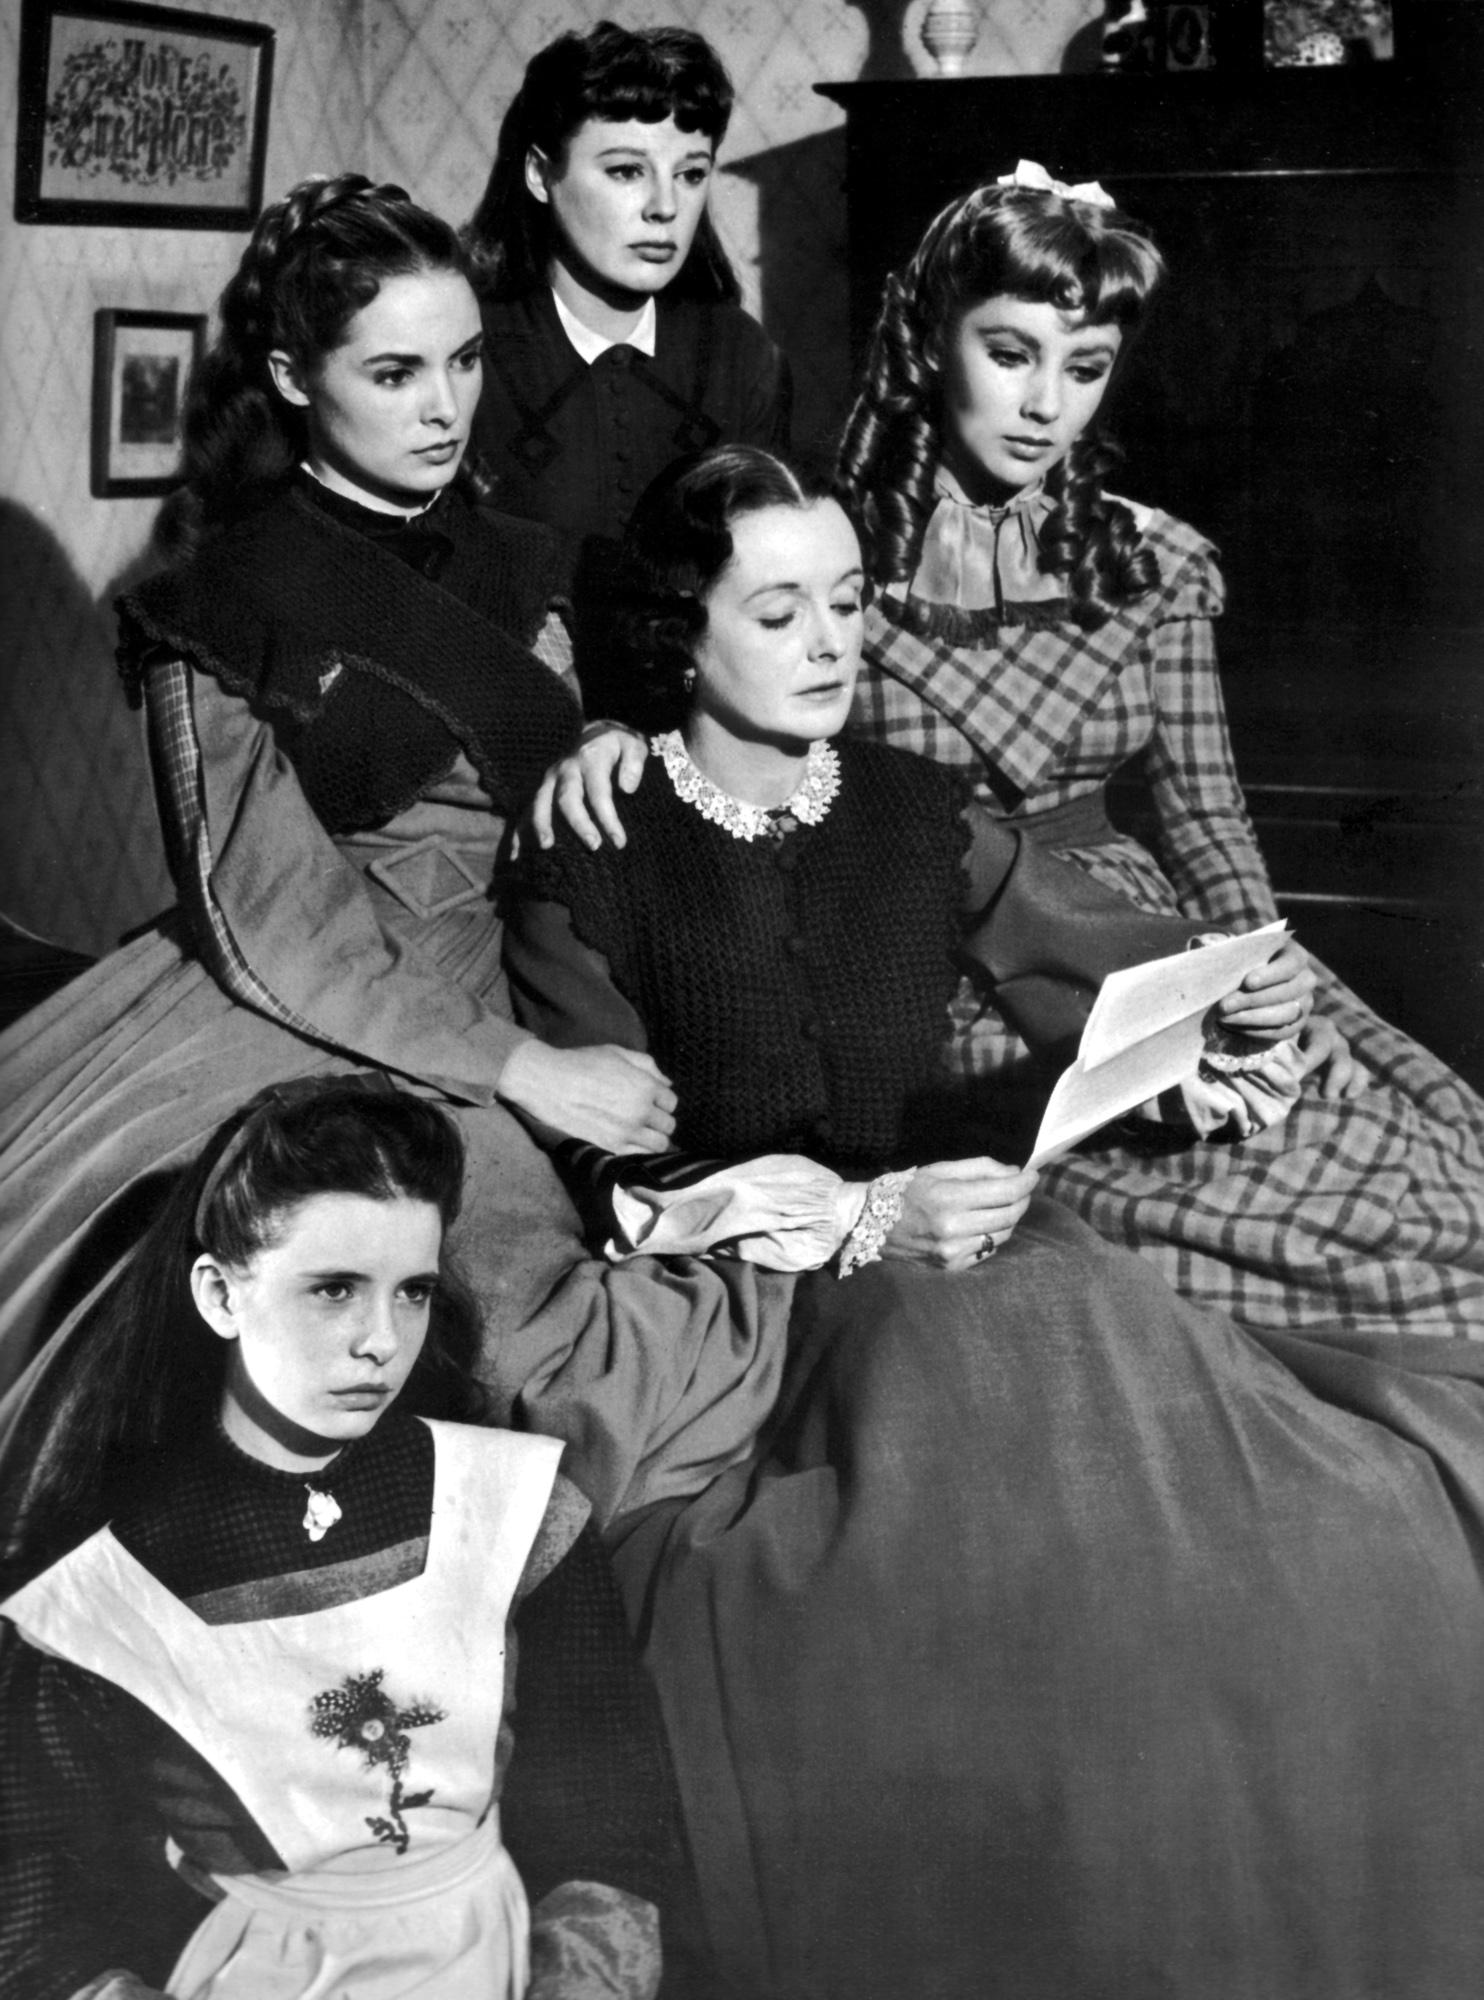 (L to R) Margaret O'Brien Janet Leigh, June Allyson, Mary Astor, Elizabeth Taylor